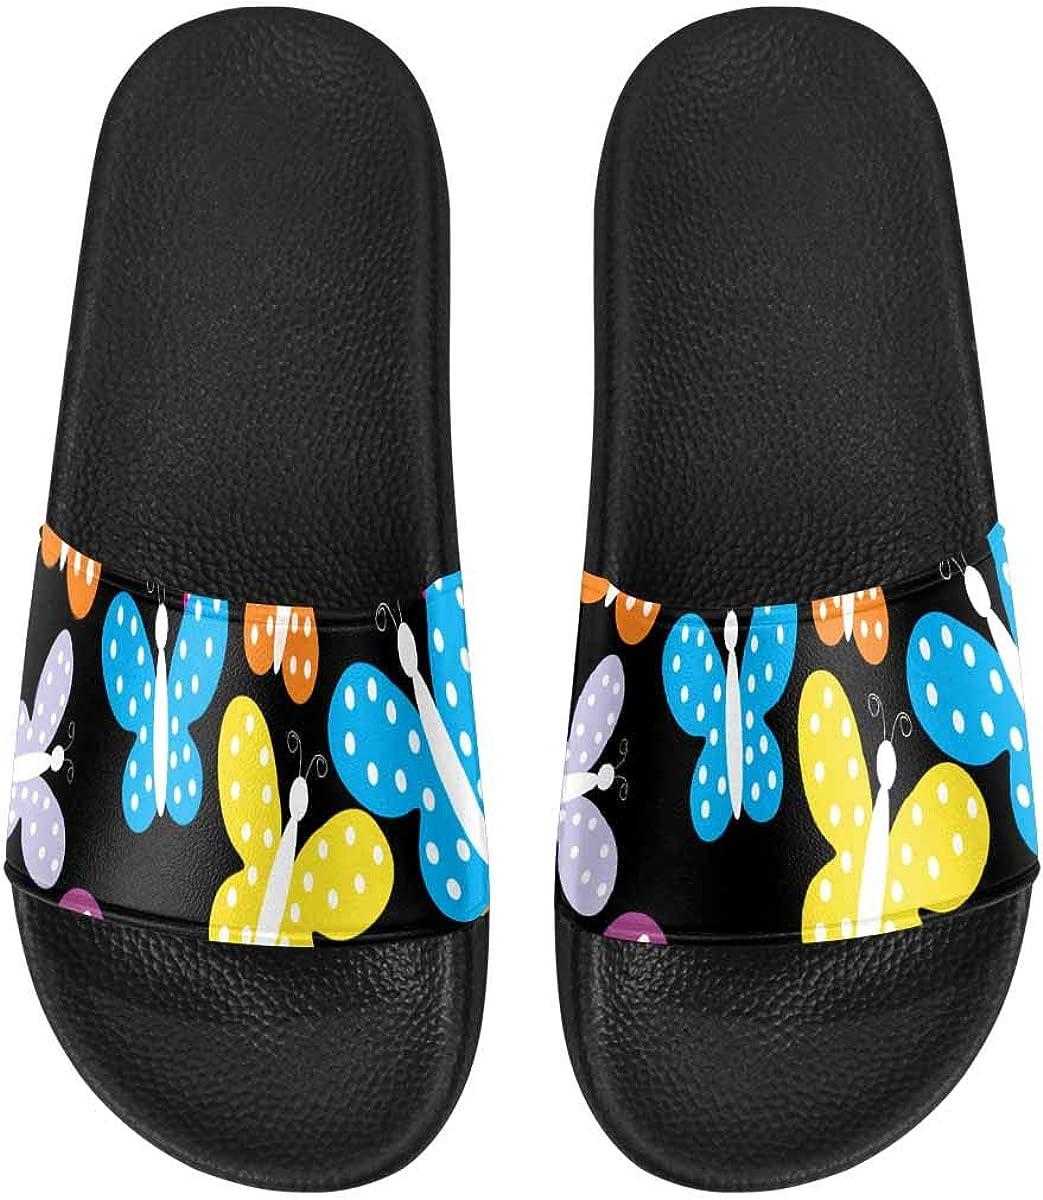 INTERESTPRINT Womens Slip-on Shoes Beach Pool Shower Slippers US6~US12